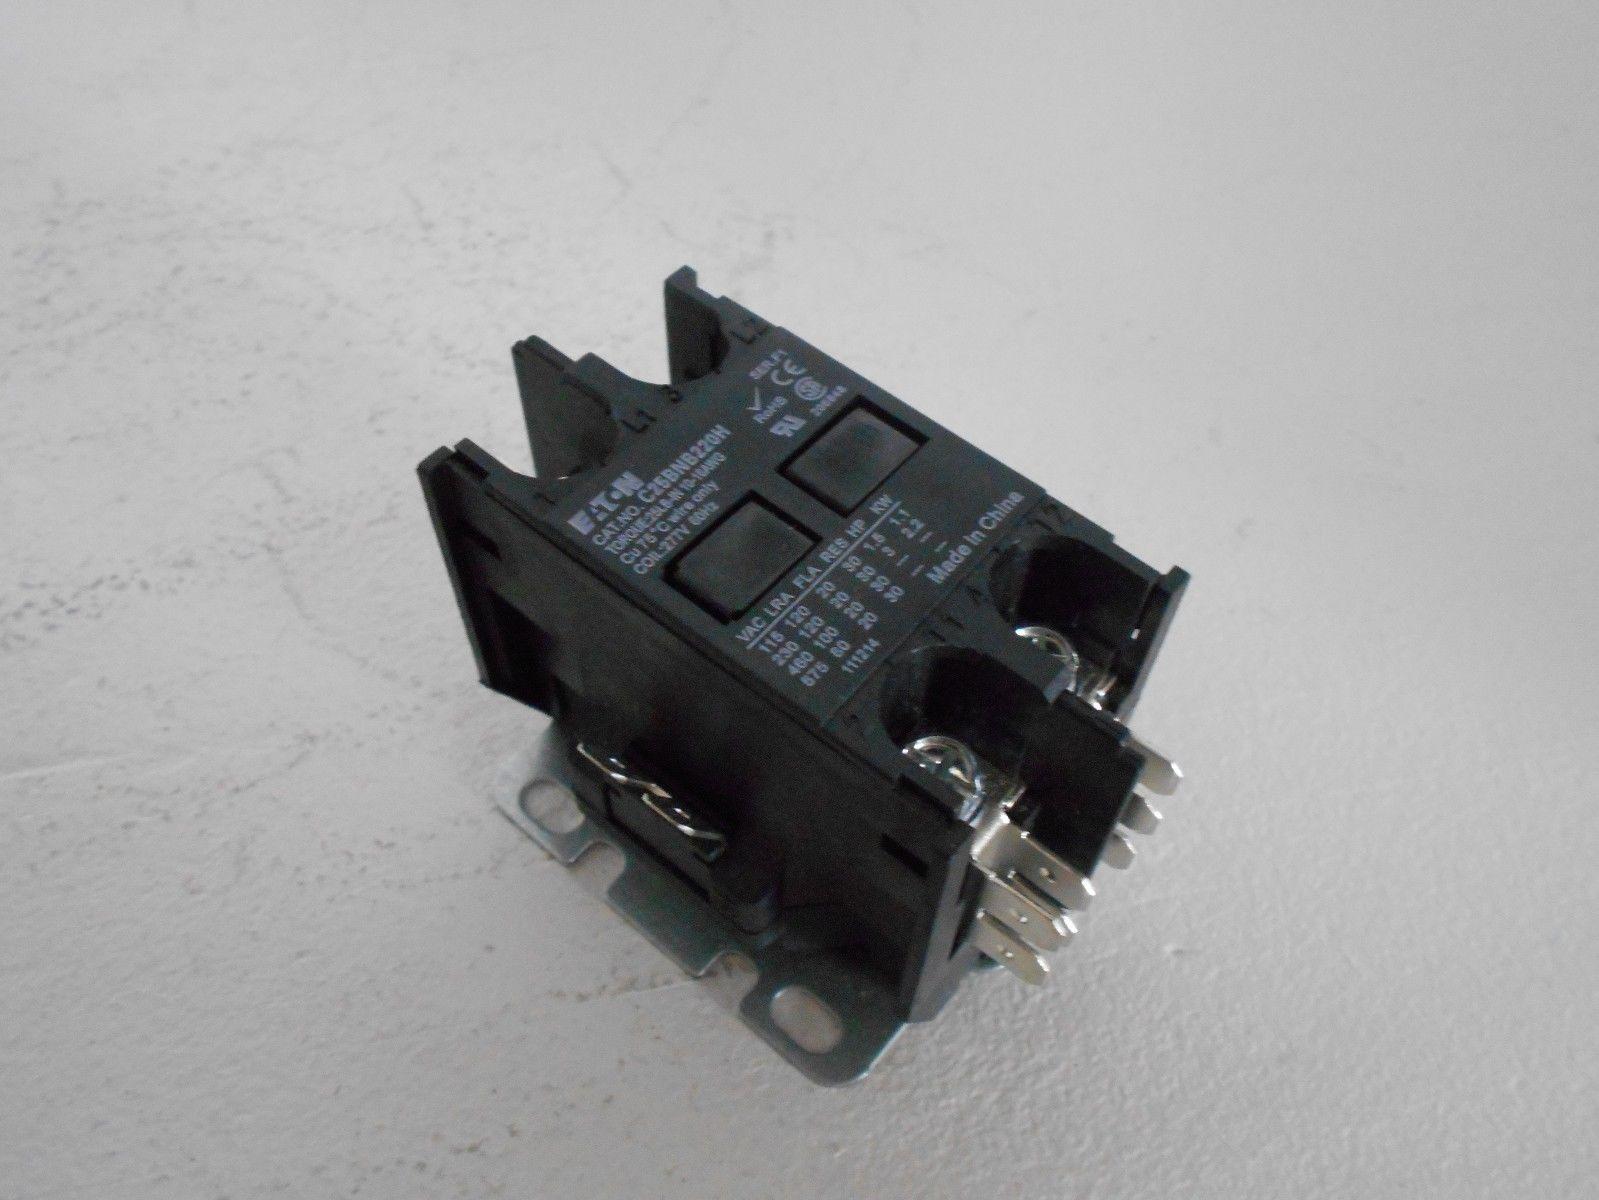 NEW IN THE BOX Eaton Cutler Hammer C25BNB220H Definite Purpose Contactor 231491980923 3?fit\\\\\\\=1000%2C750\\\\\\\&ssl\\\\\\\=1 mcg contactor wiring diagram contactor wiring diagram single phase mcg contactors wiring diagram at couponss.co